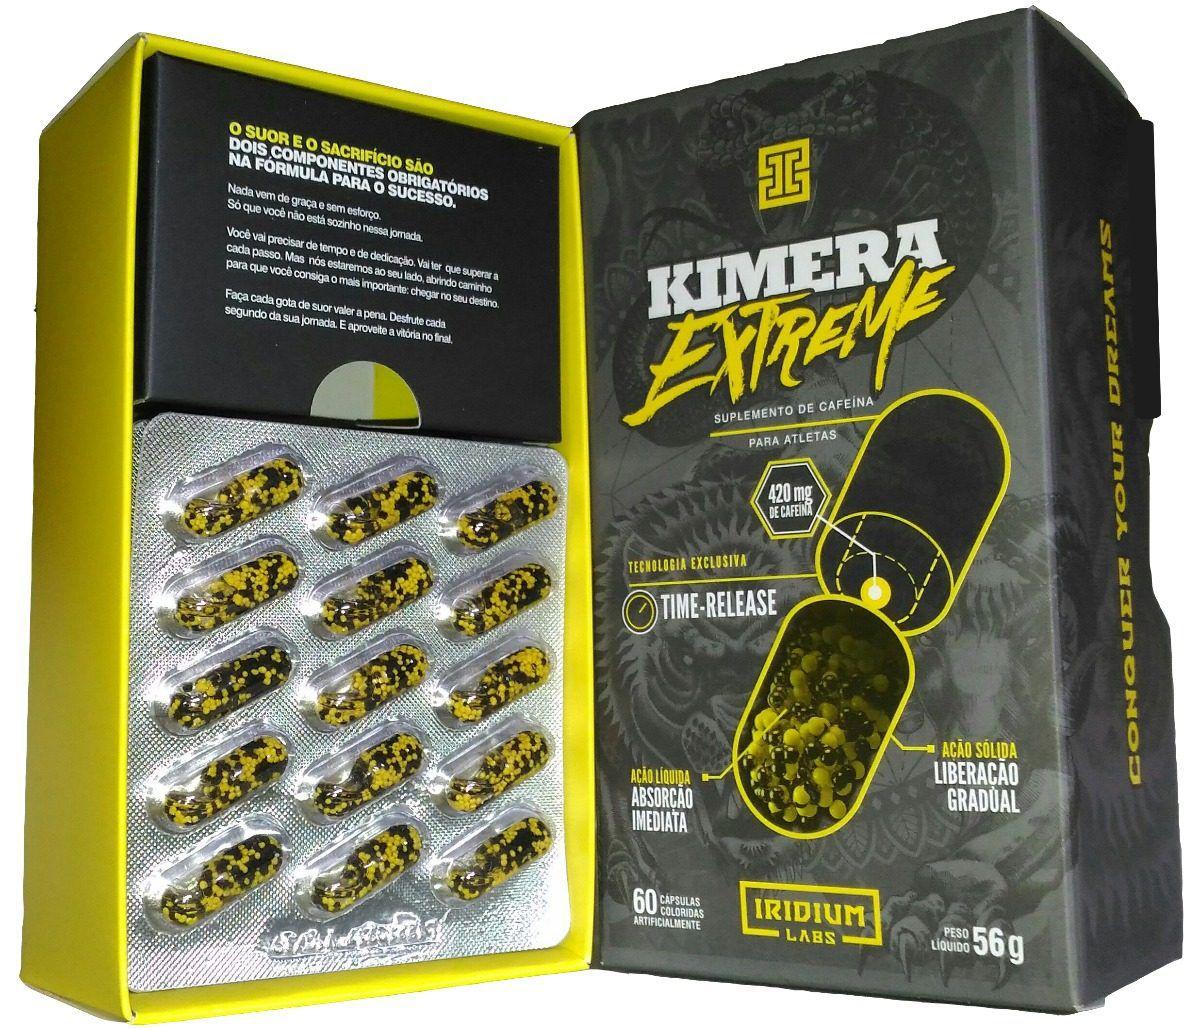 Kimera extreme 60 Caps - Iridium Labs